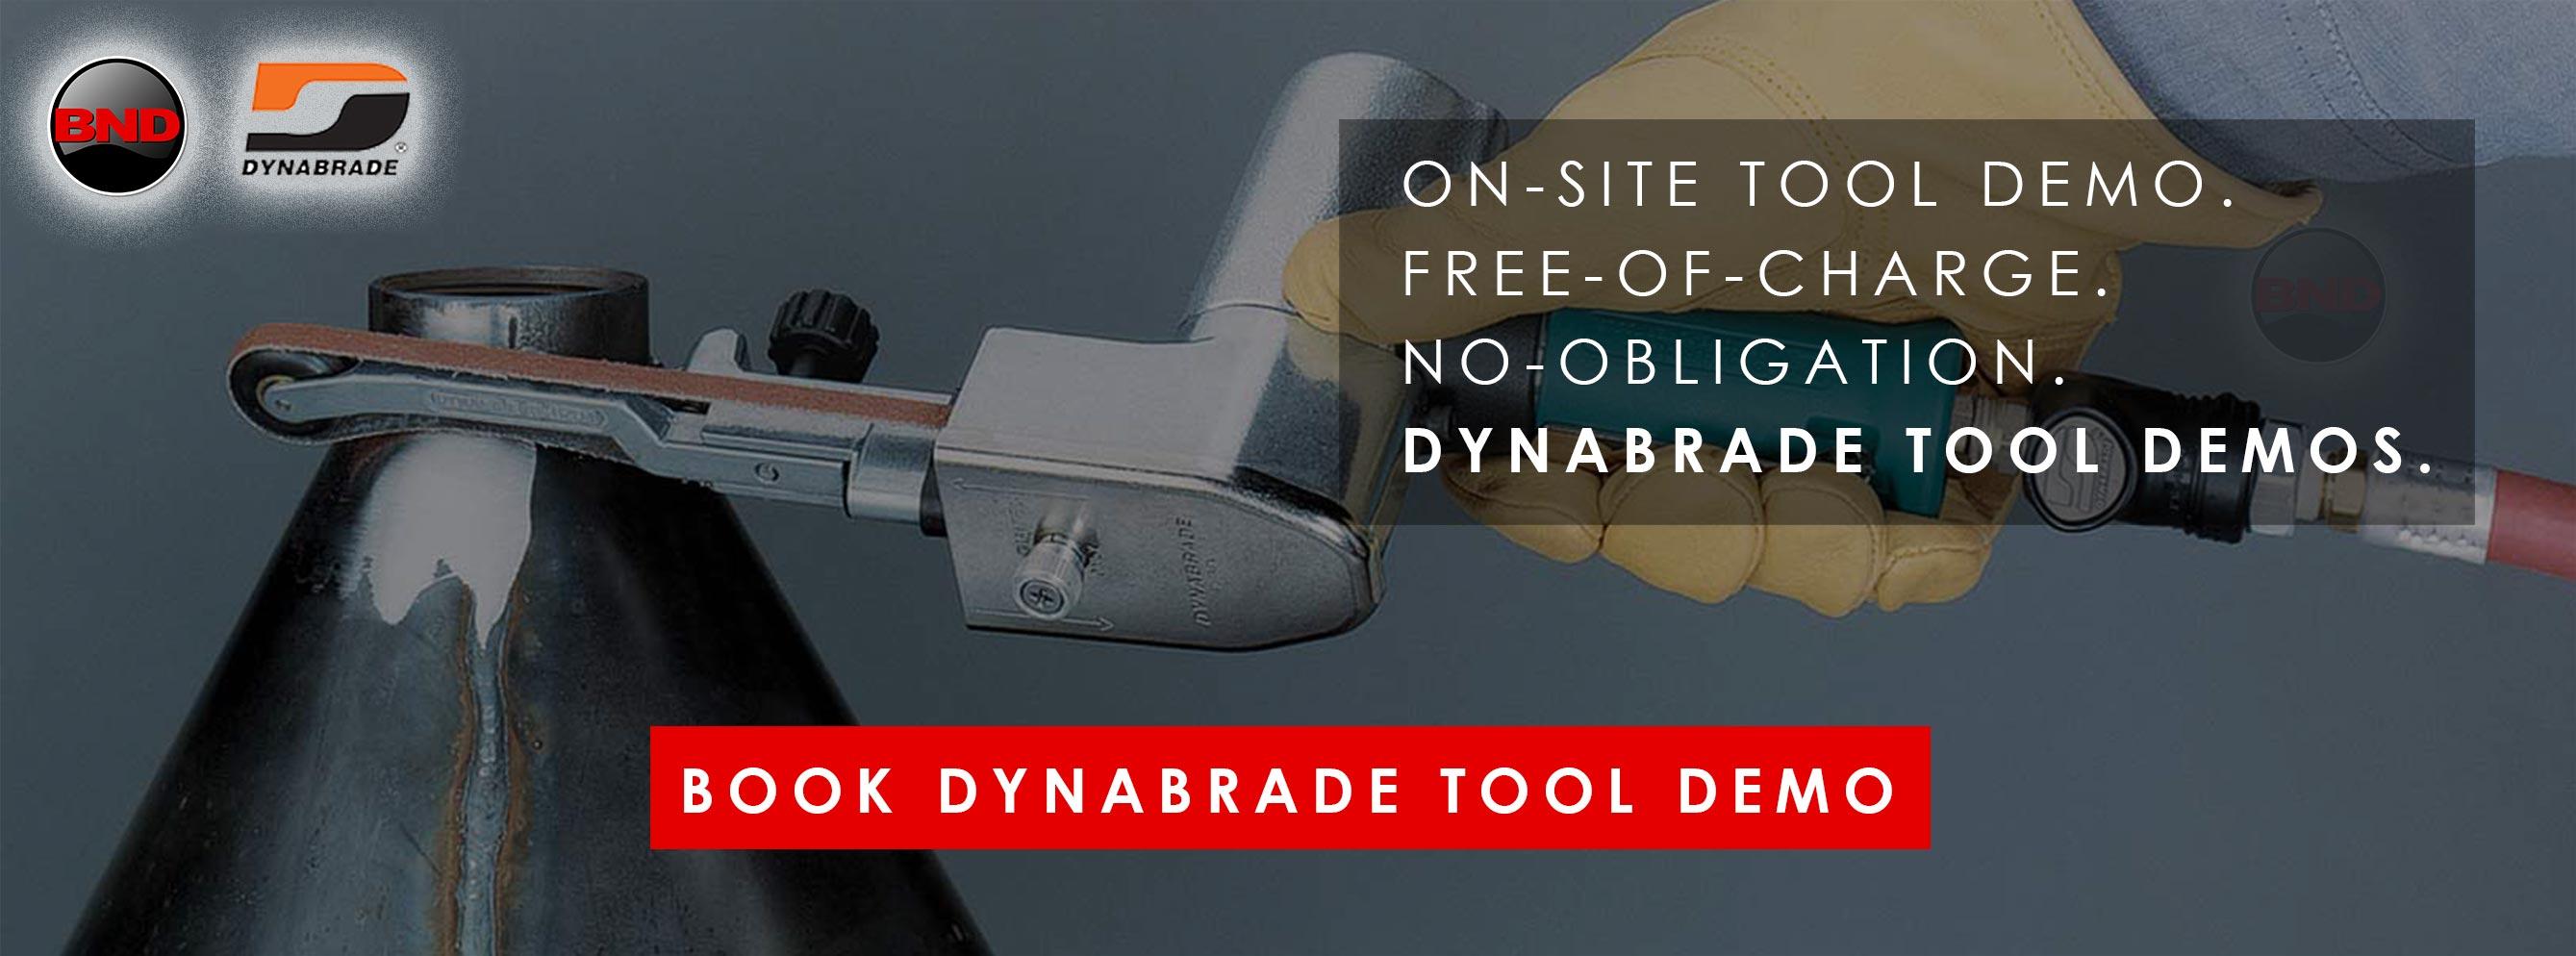 Book Dynabrade Tool Demo